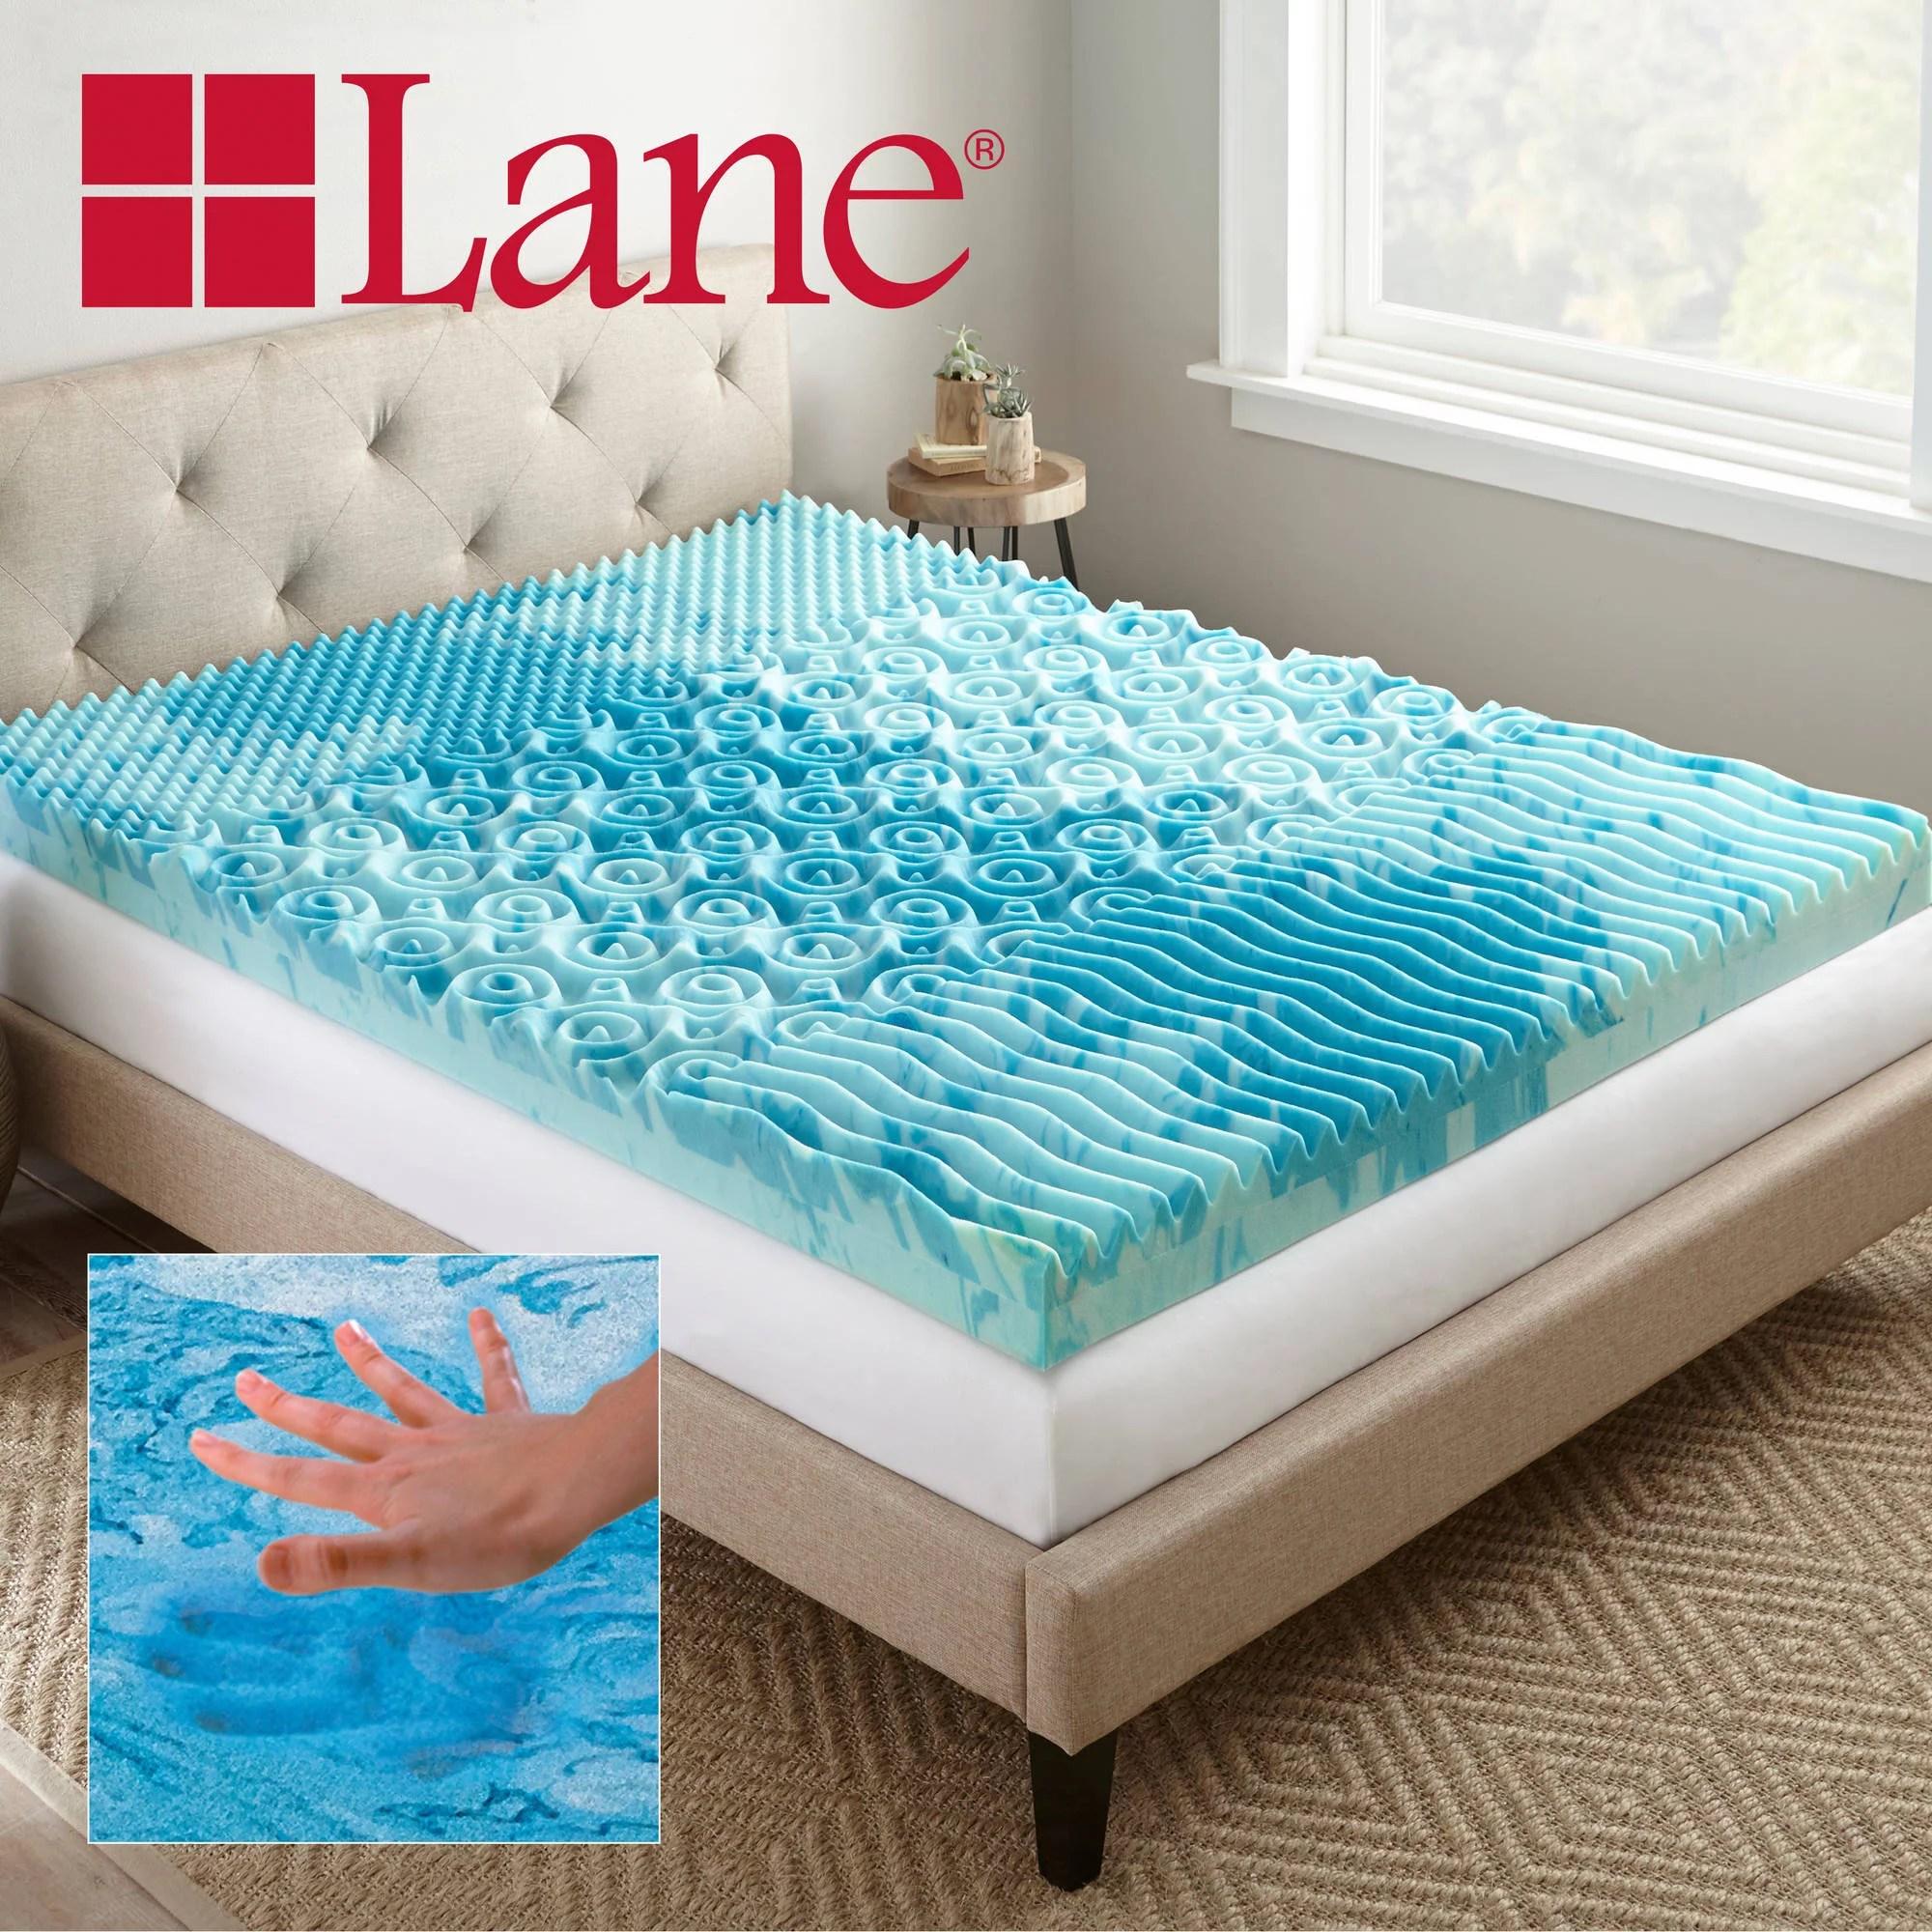 Memory Foam Mattress Topper Cooling Gel Blue Cover 4 Inch ...